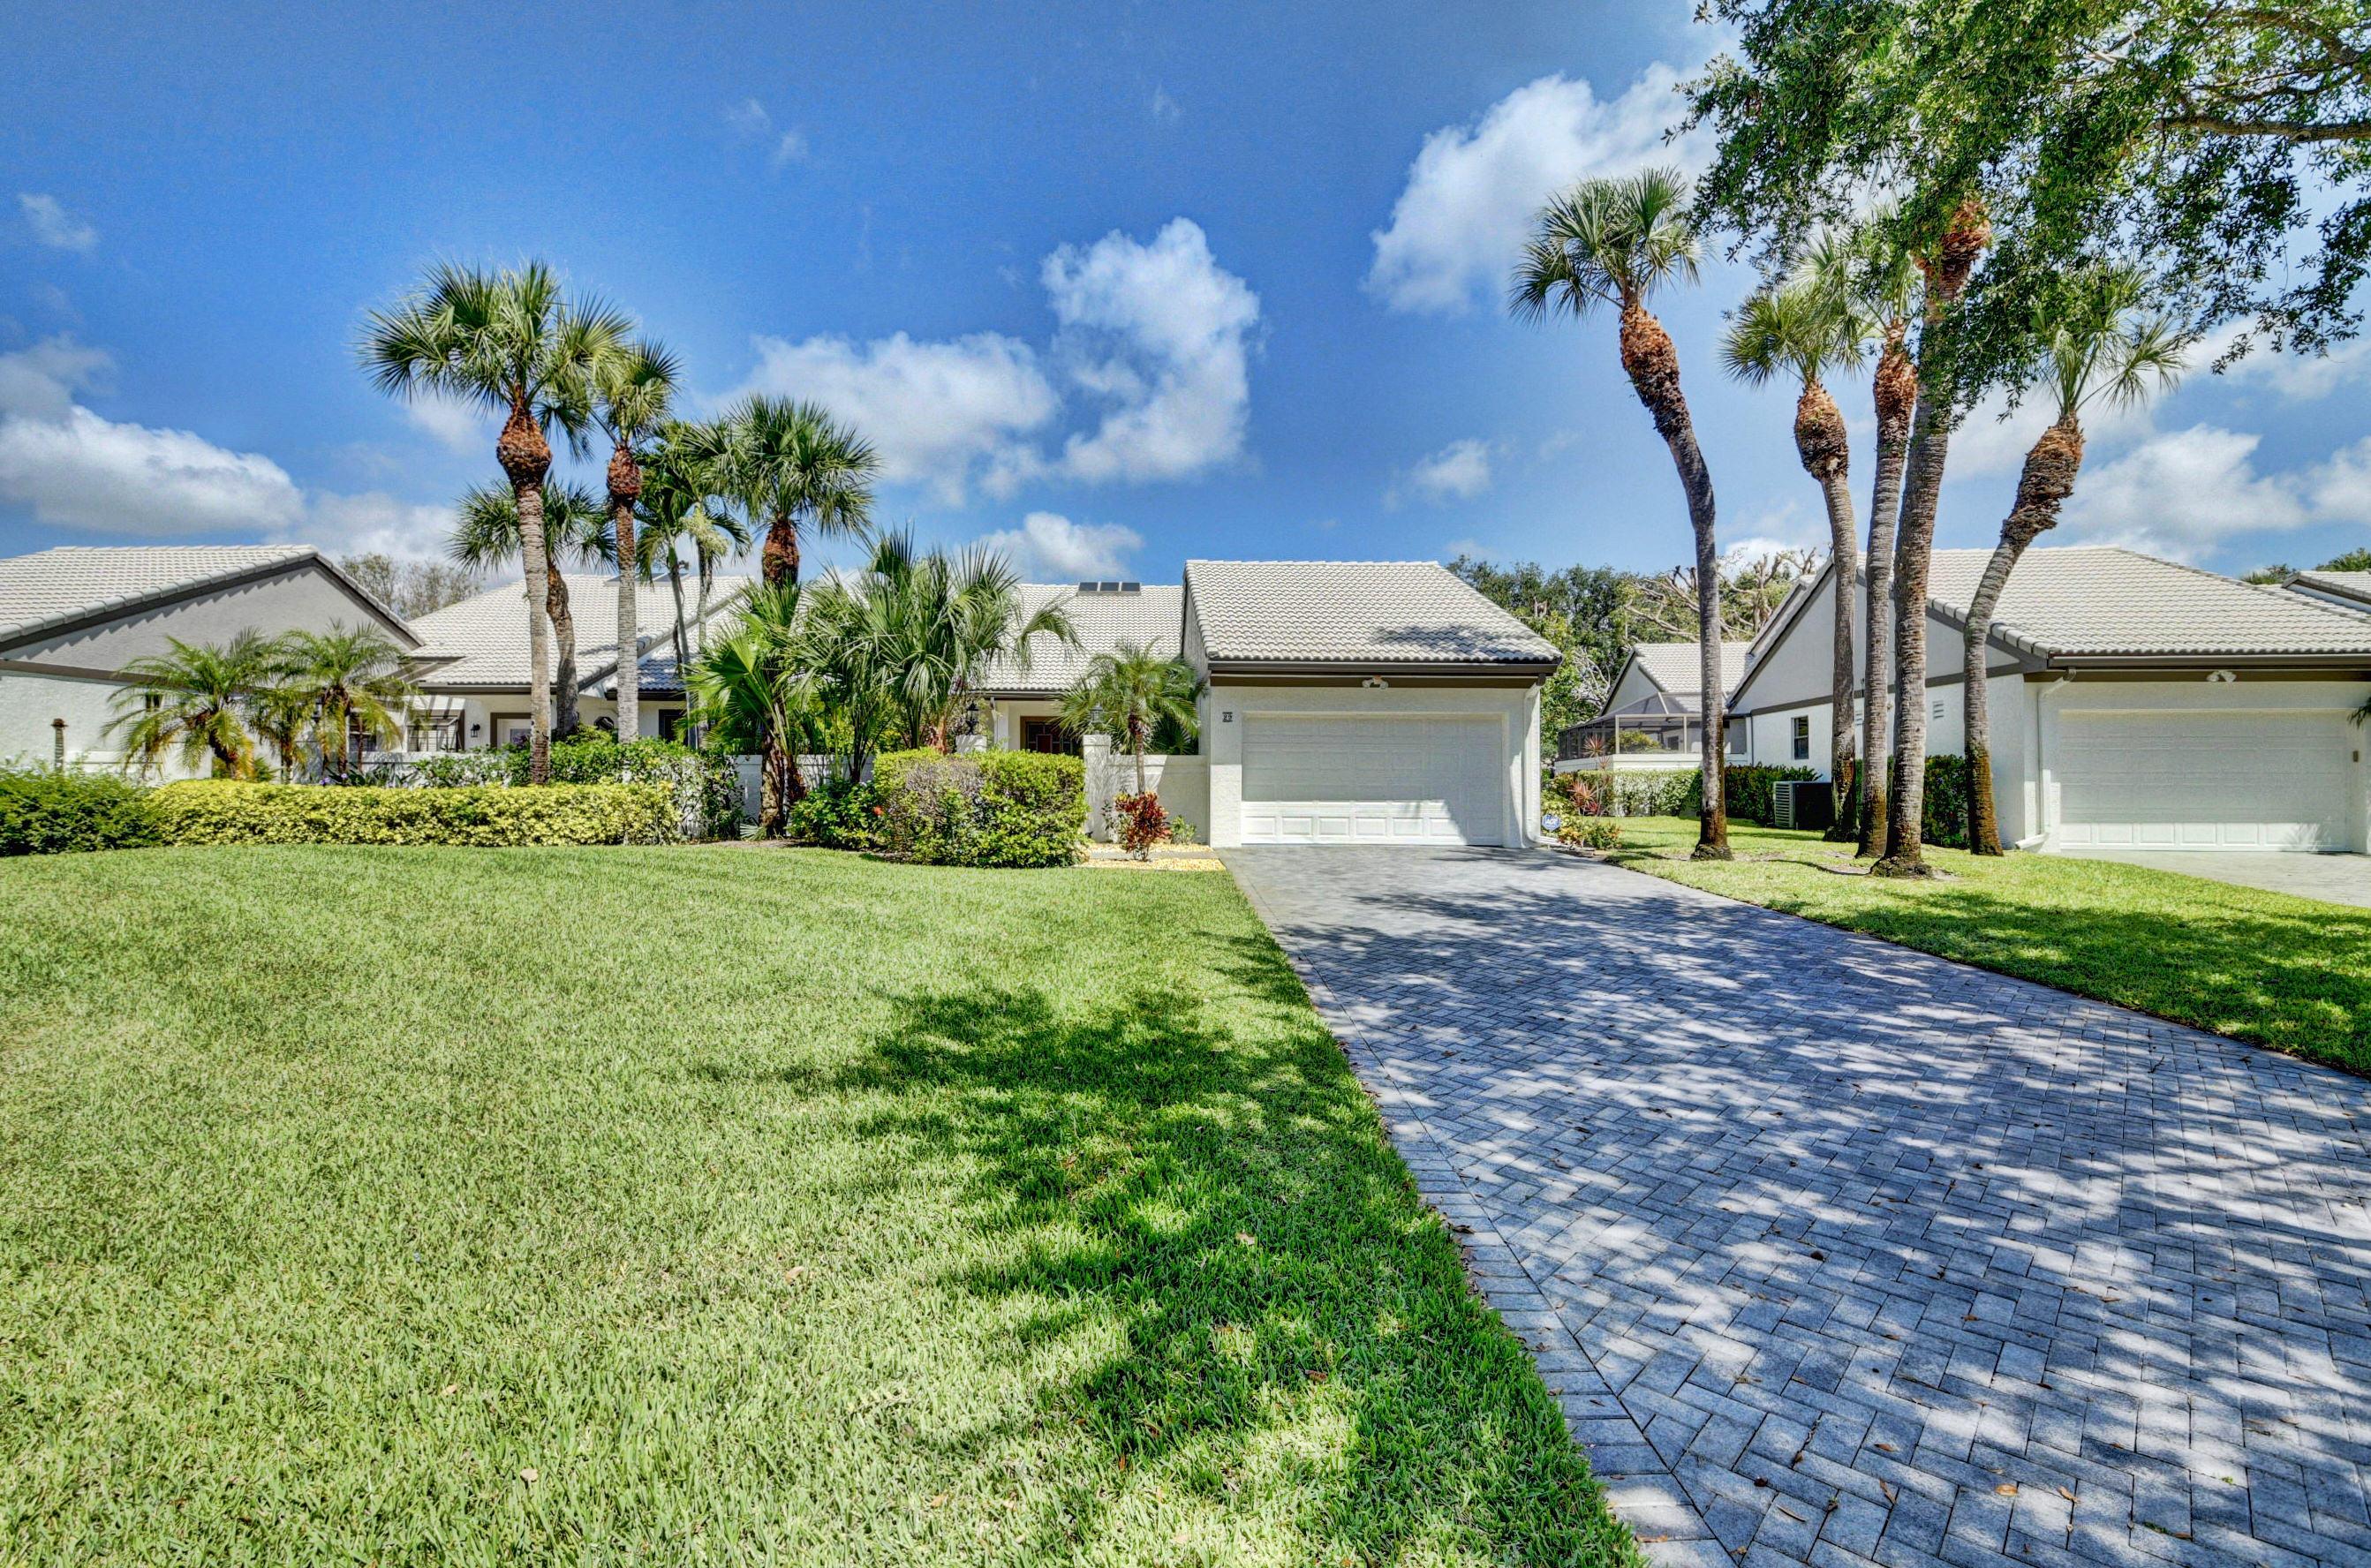 29 Clubhouse Lane Boynton Beach, FL 33436